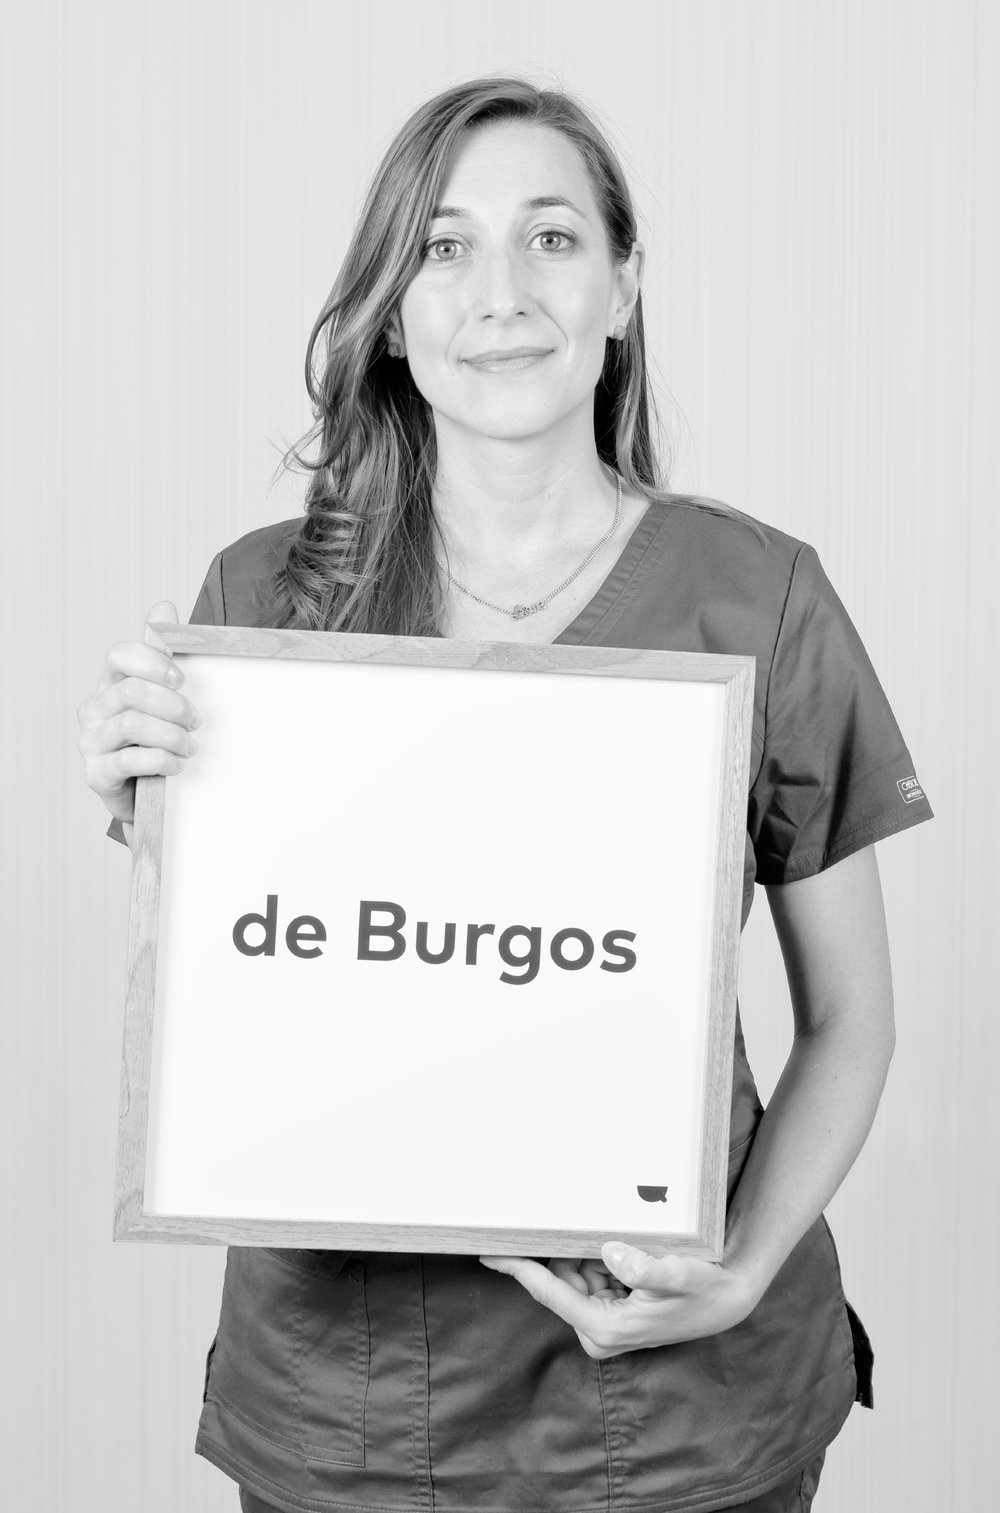 BUQUO-DOCTORES-BURGOS-8.jpg